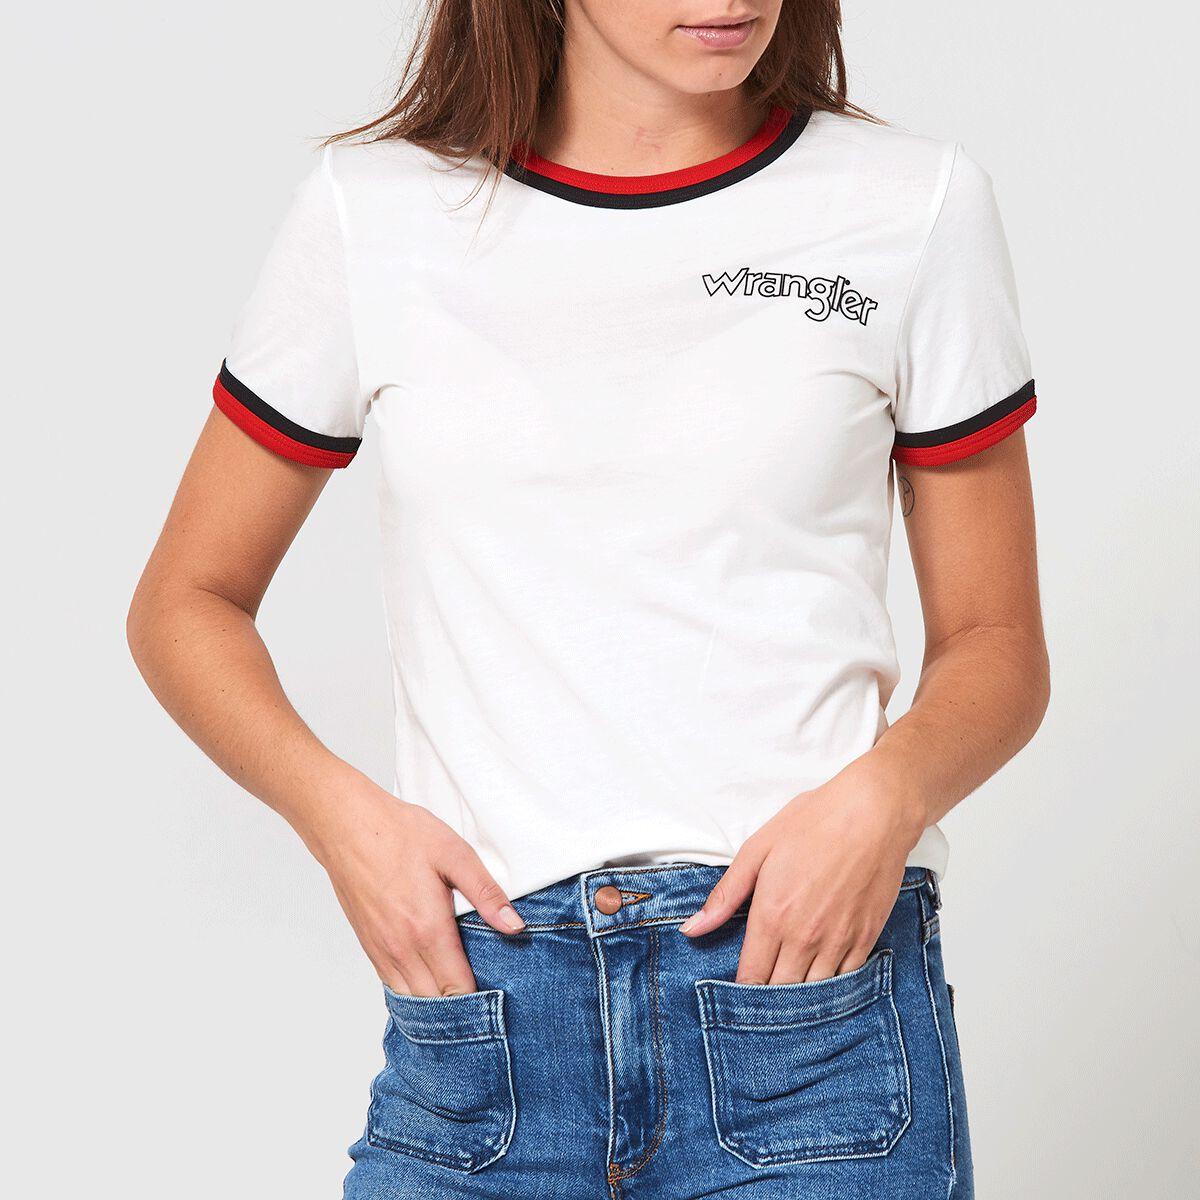 Schatz als seltenes Gut Repliken Qualitätsprodukte T-shirt Wrangler Ringer